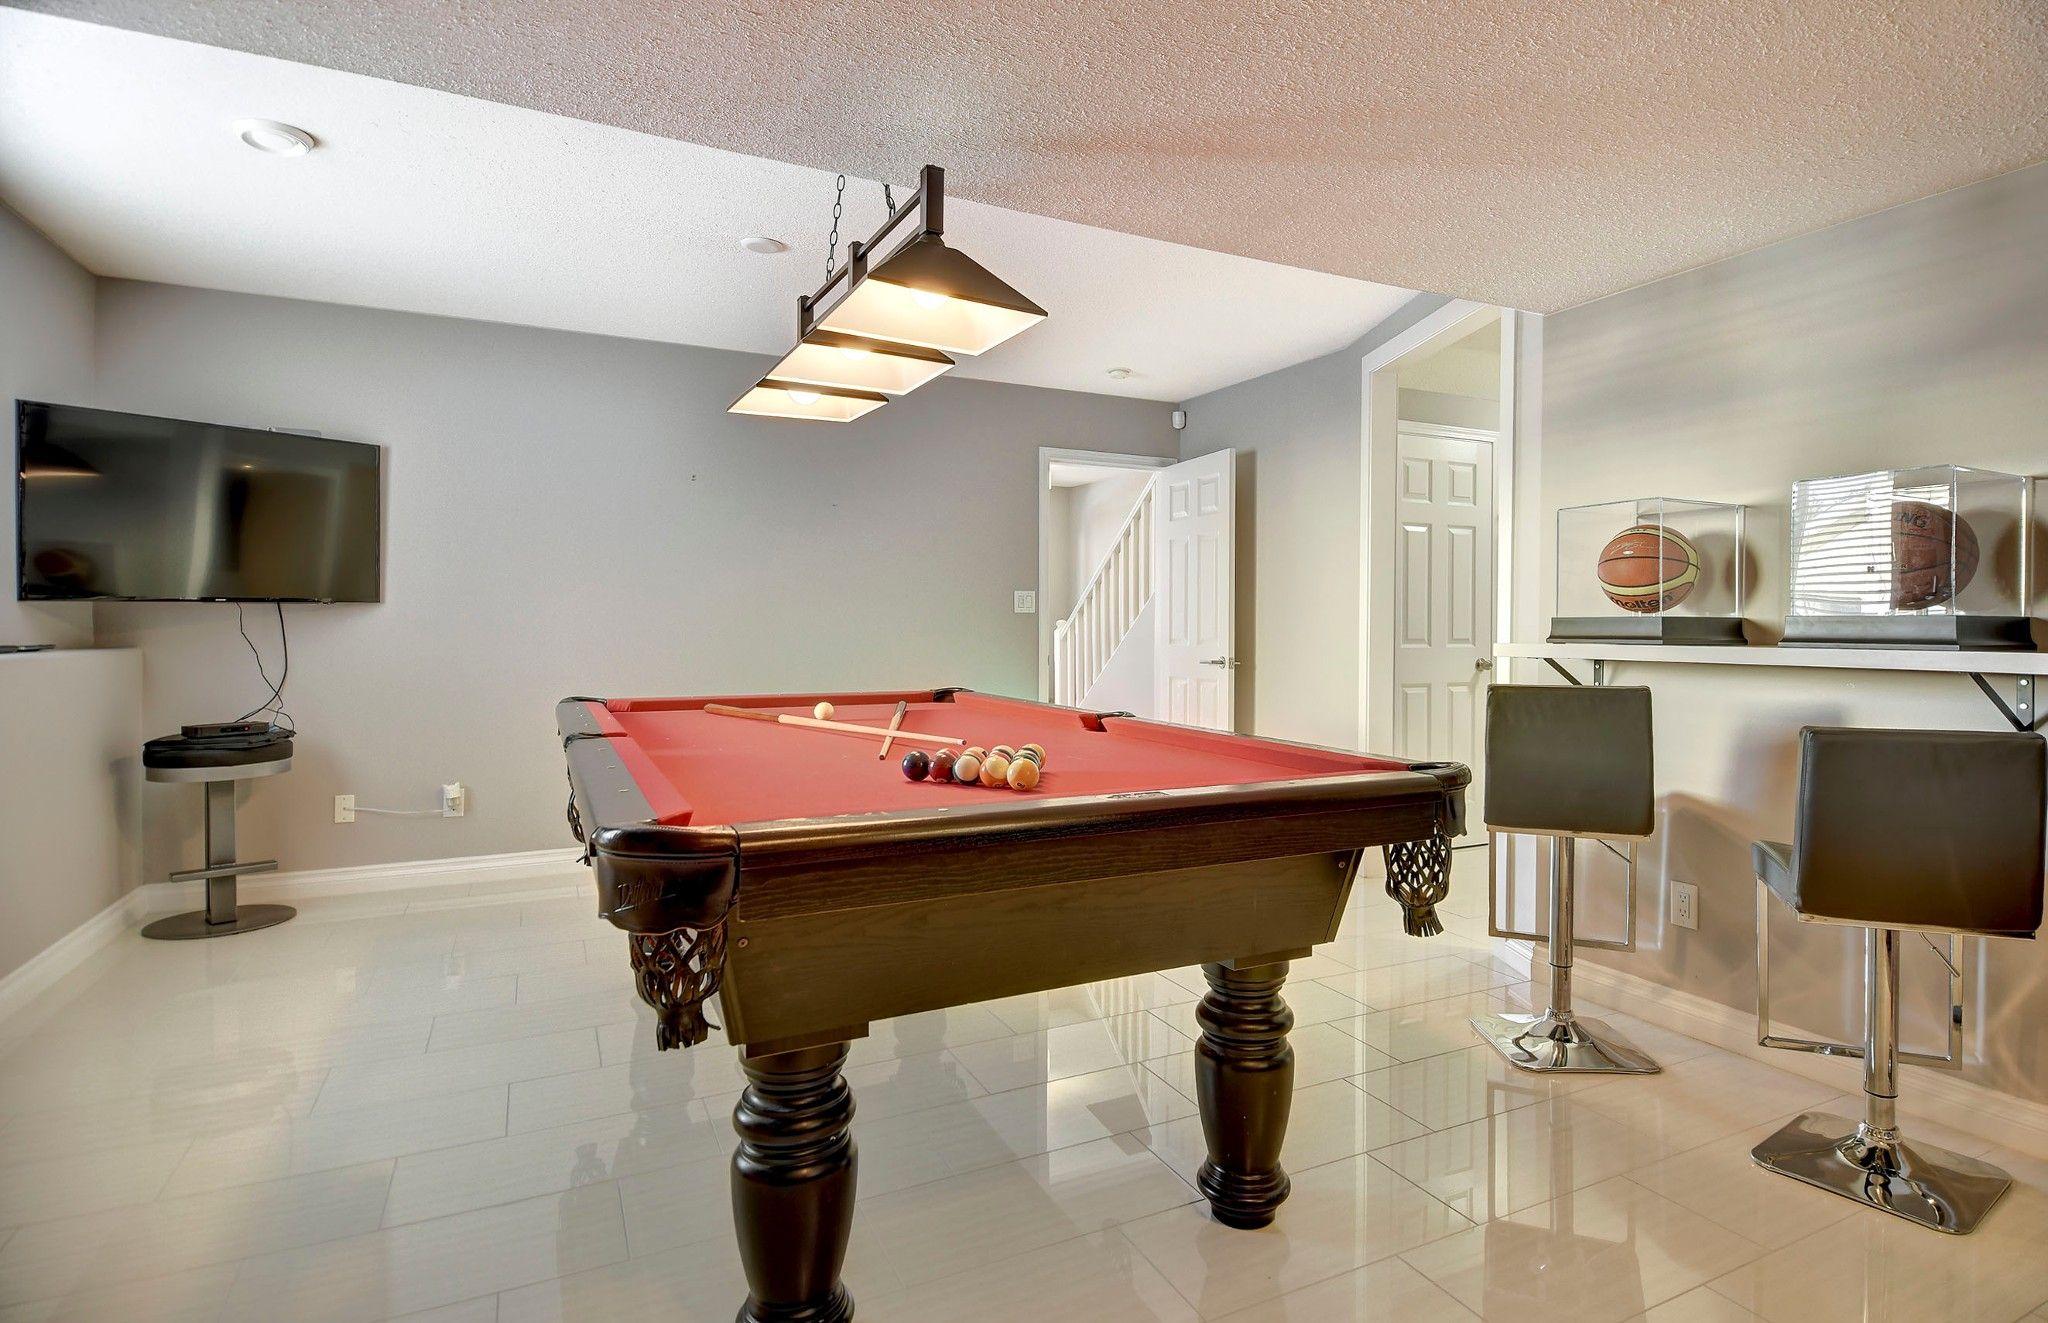 Photo 12: Photos: 270 Magic Drive in Kelowna: House for sale : MLS®# 10200191